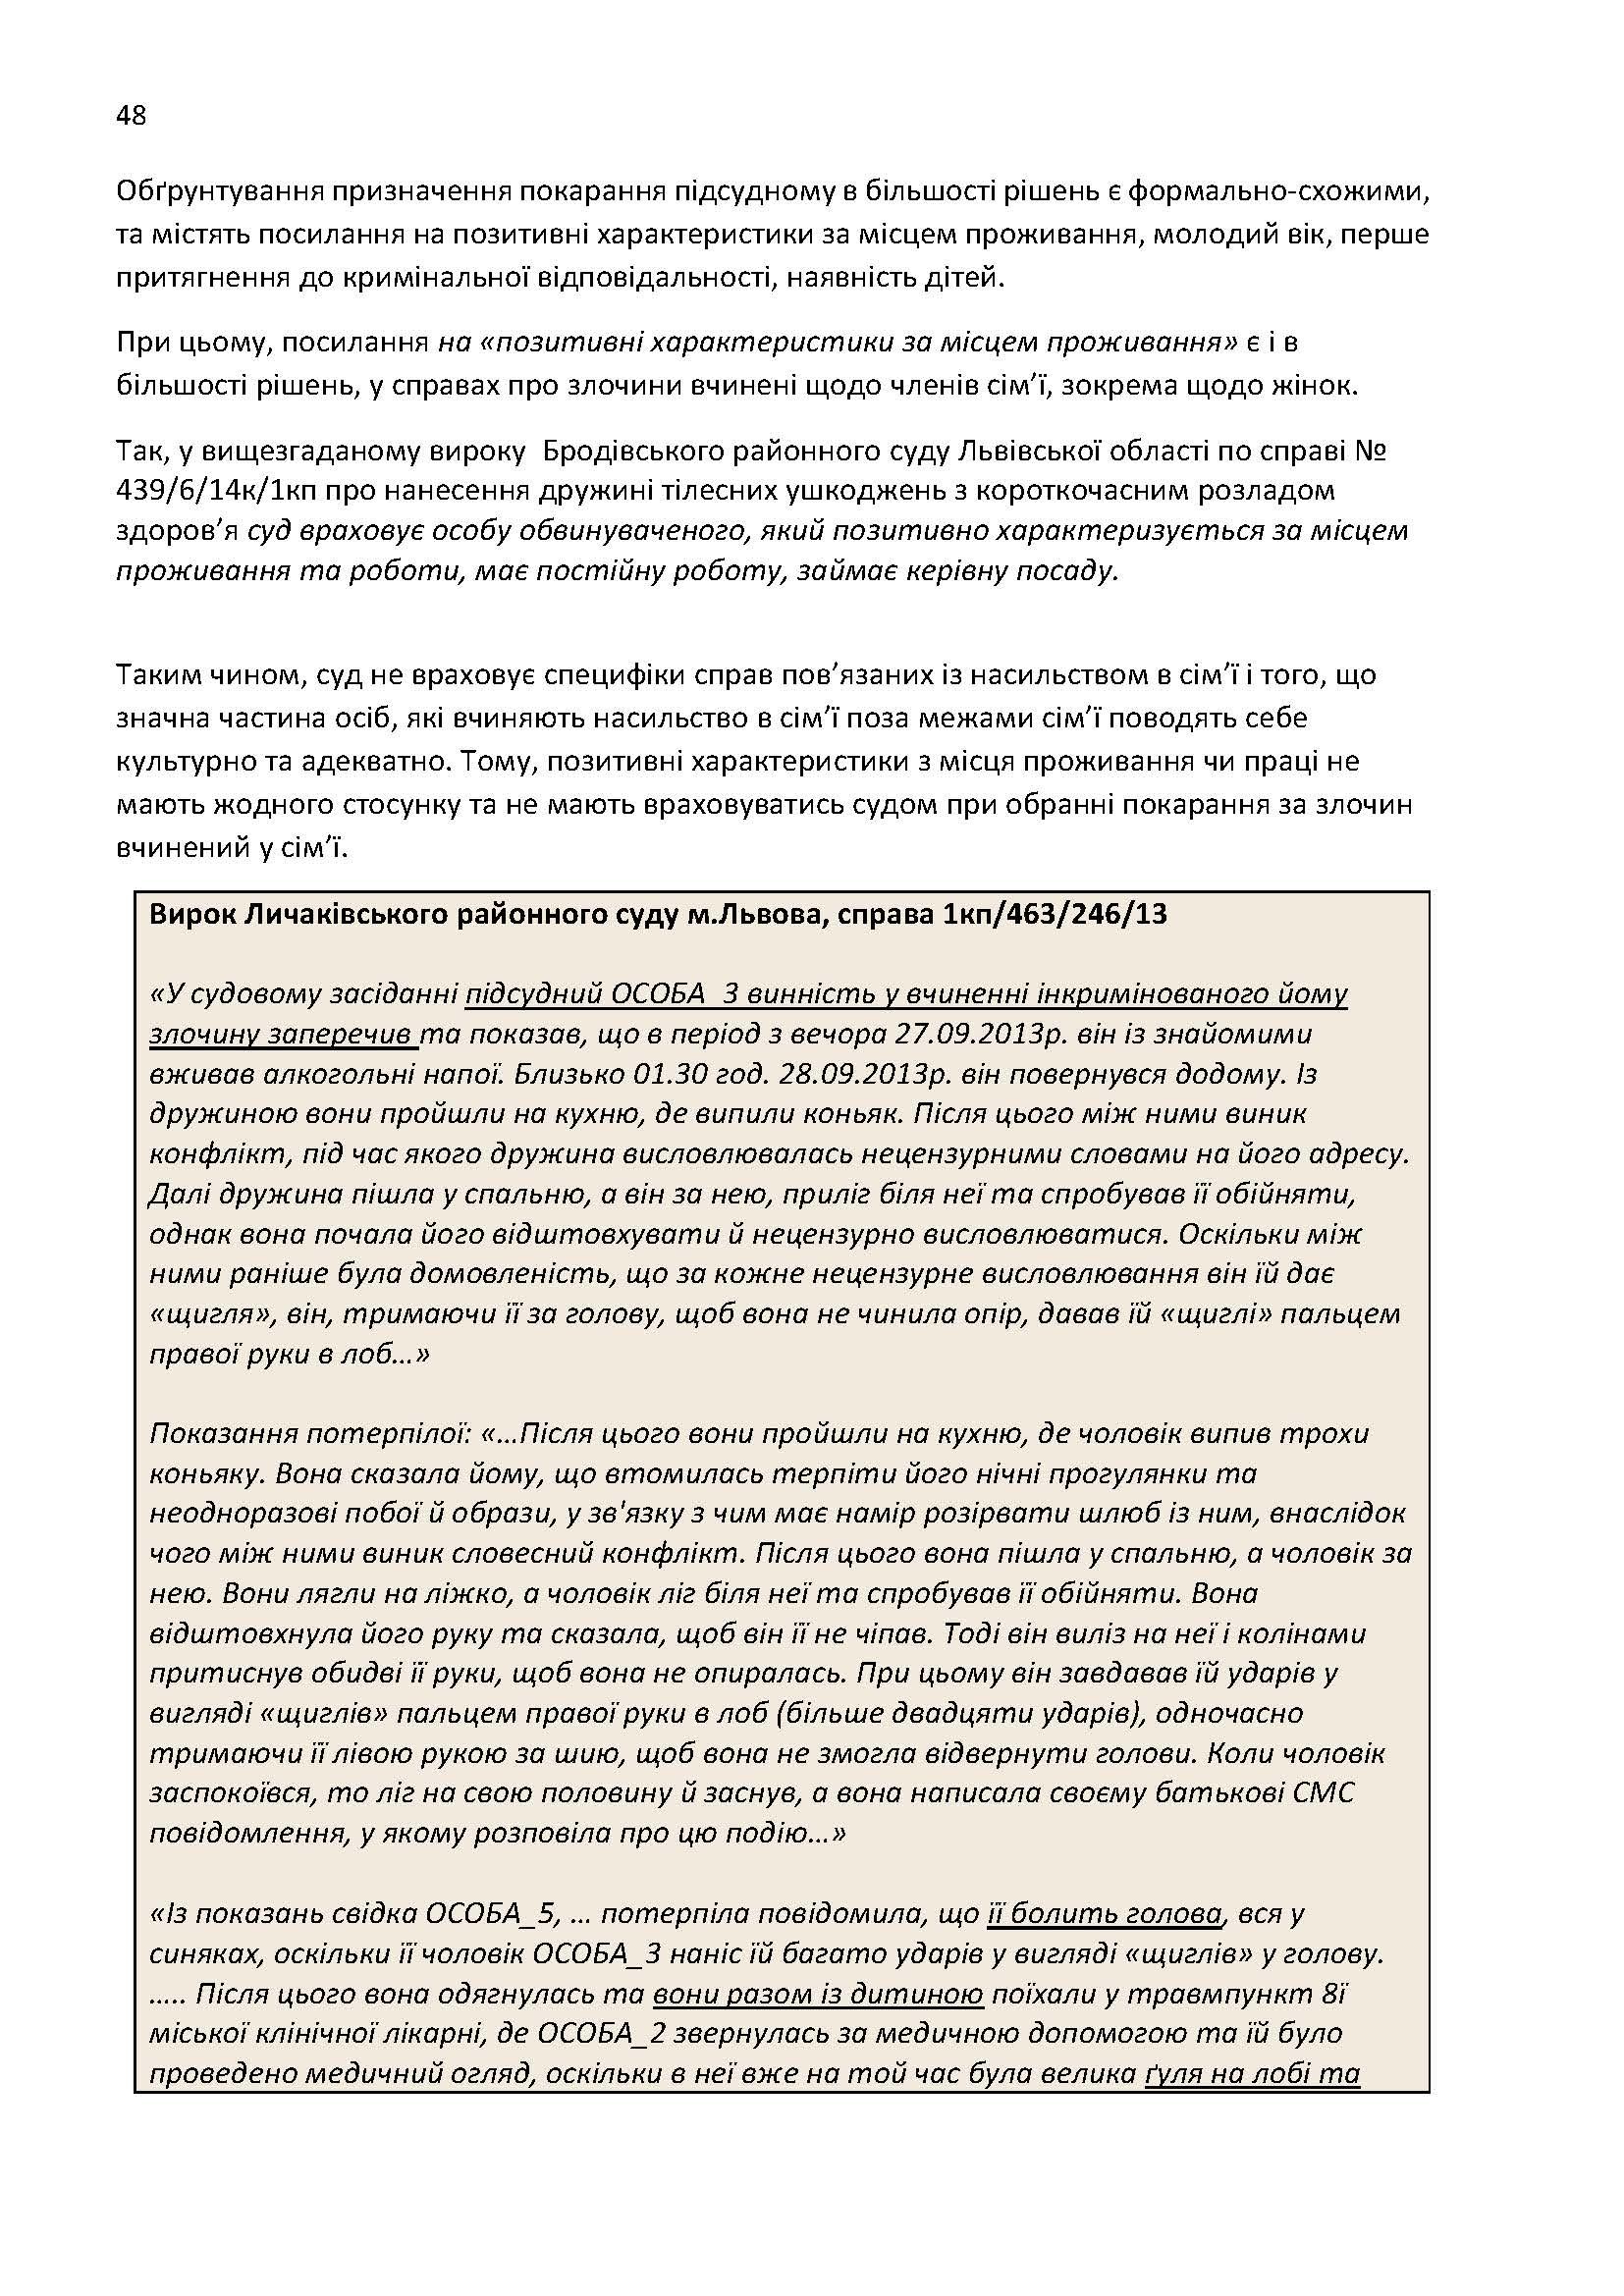 Draft Report monitoring print USAID_Страница_48